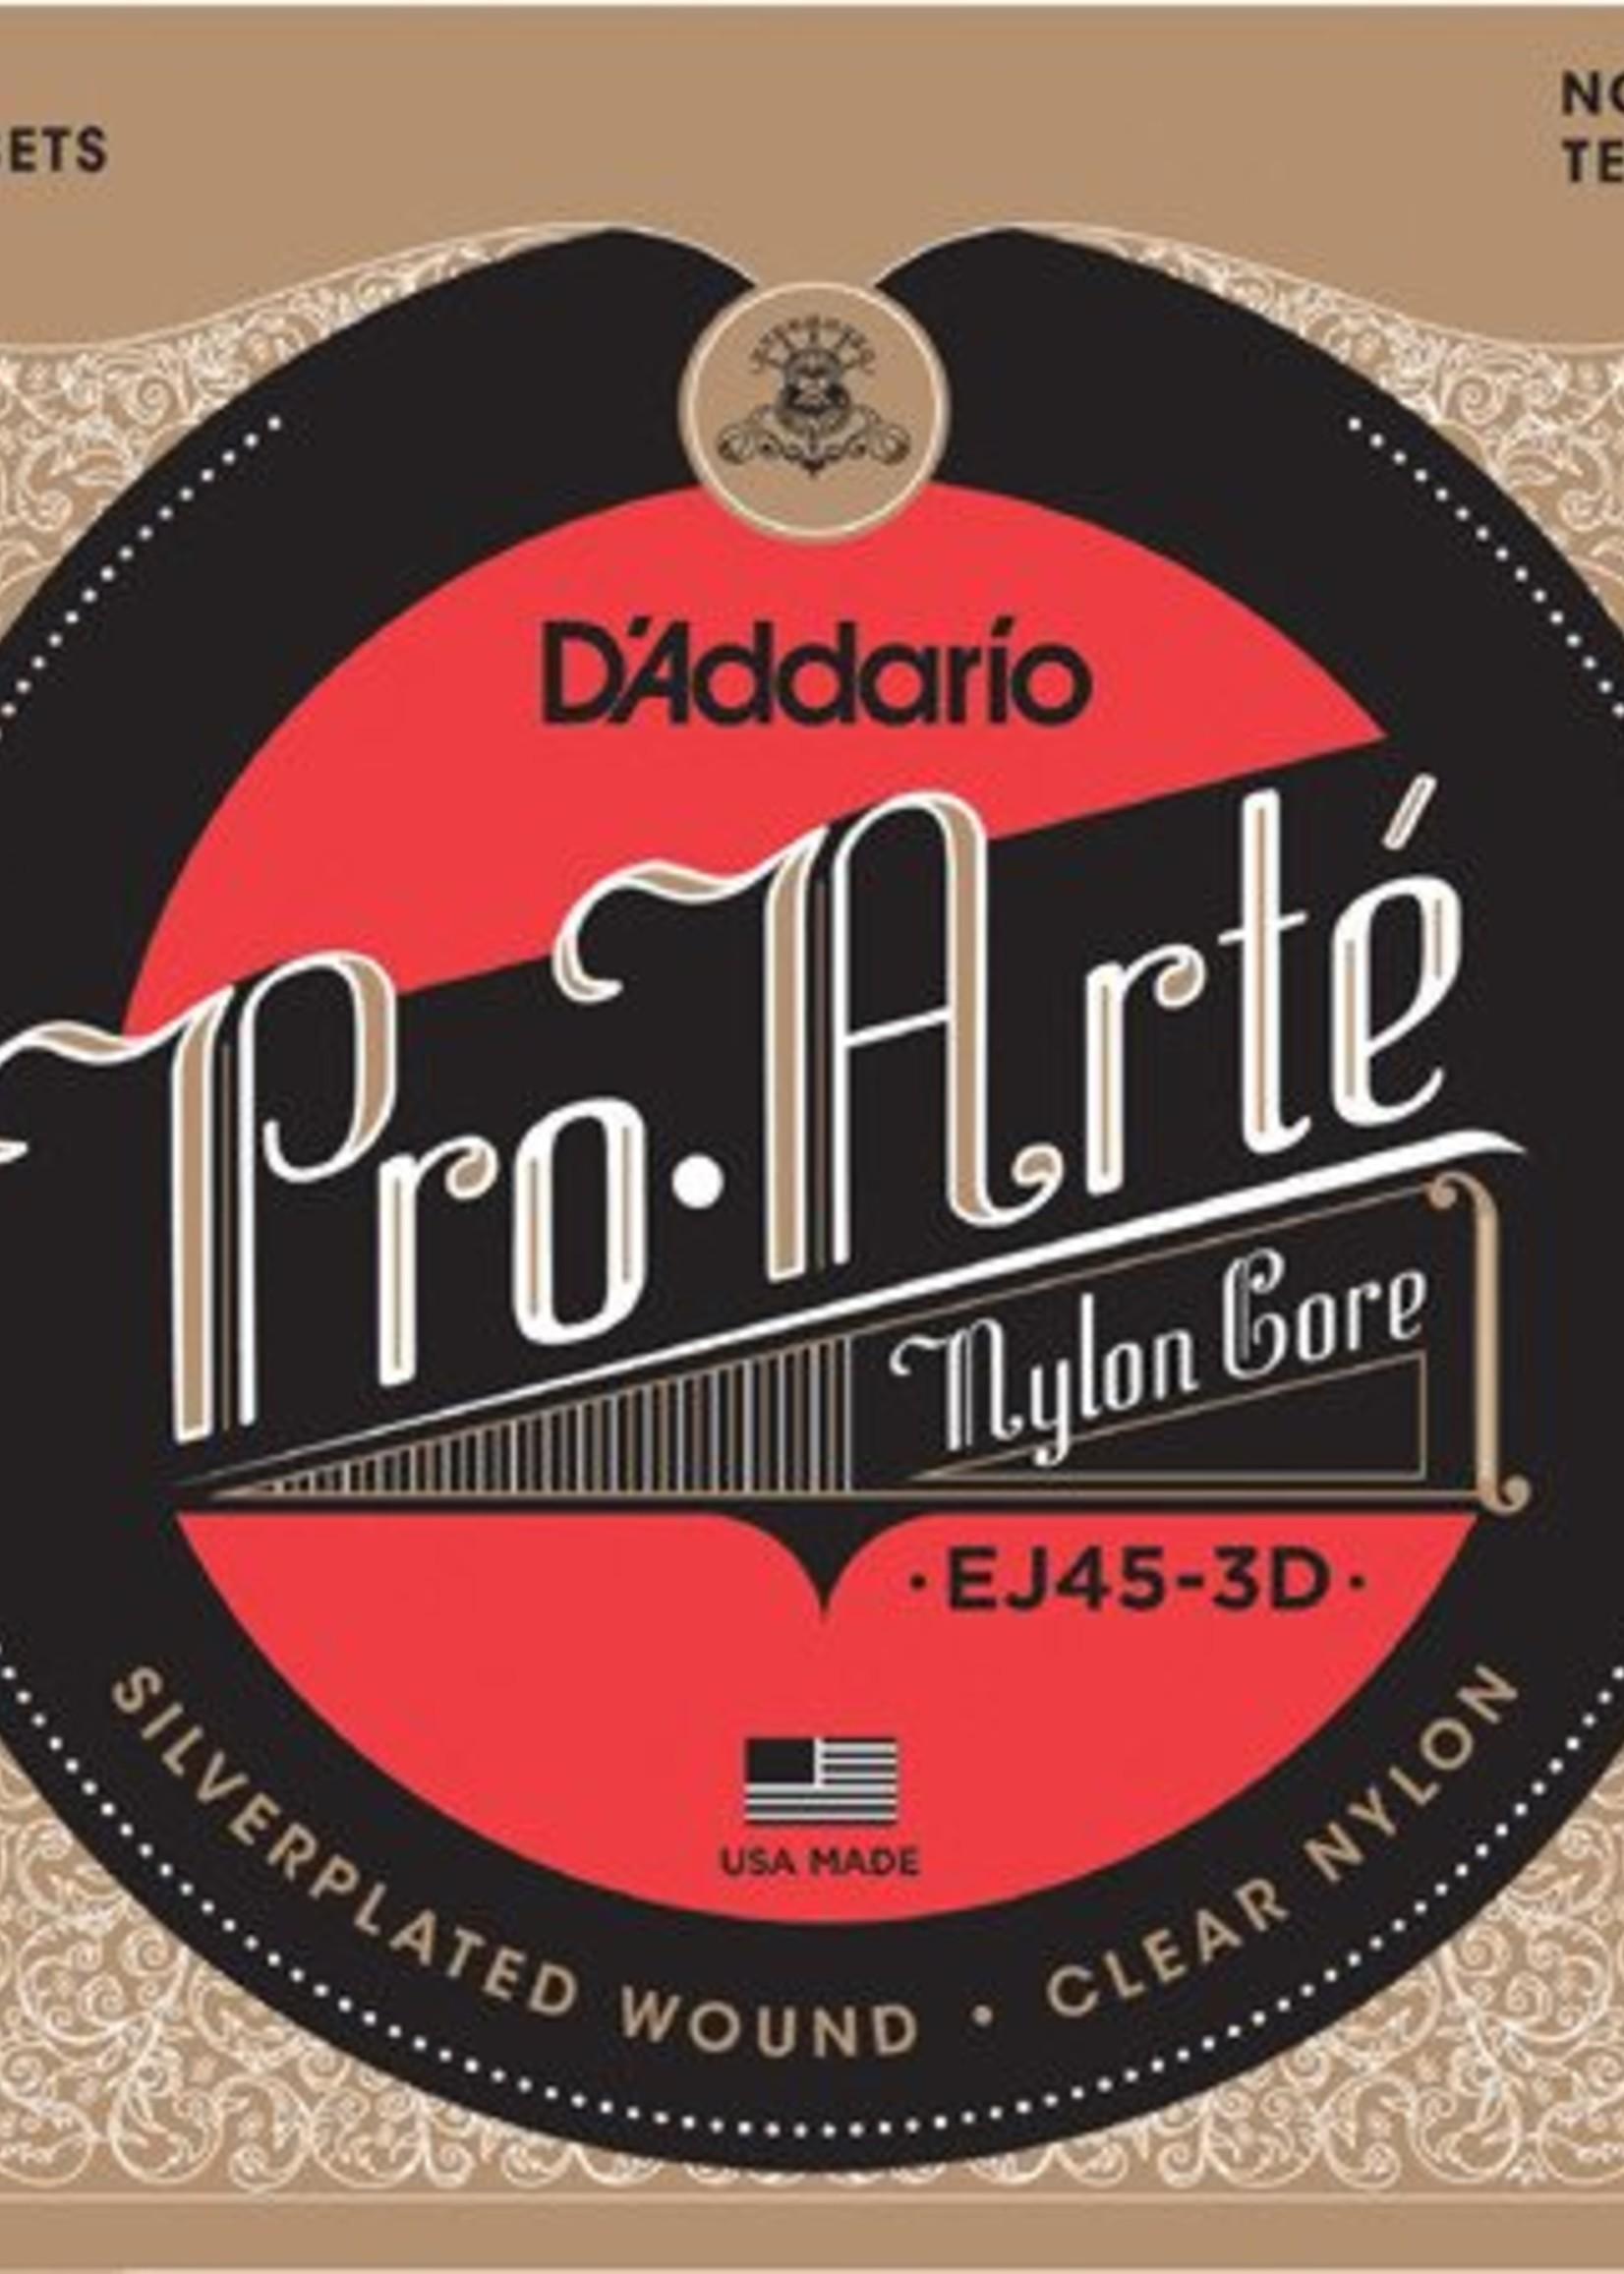 D'ADDARIO EJ45 3D CLASSIQUE D'ADDARIO